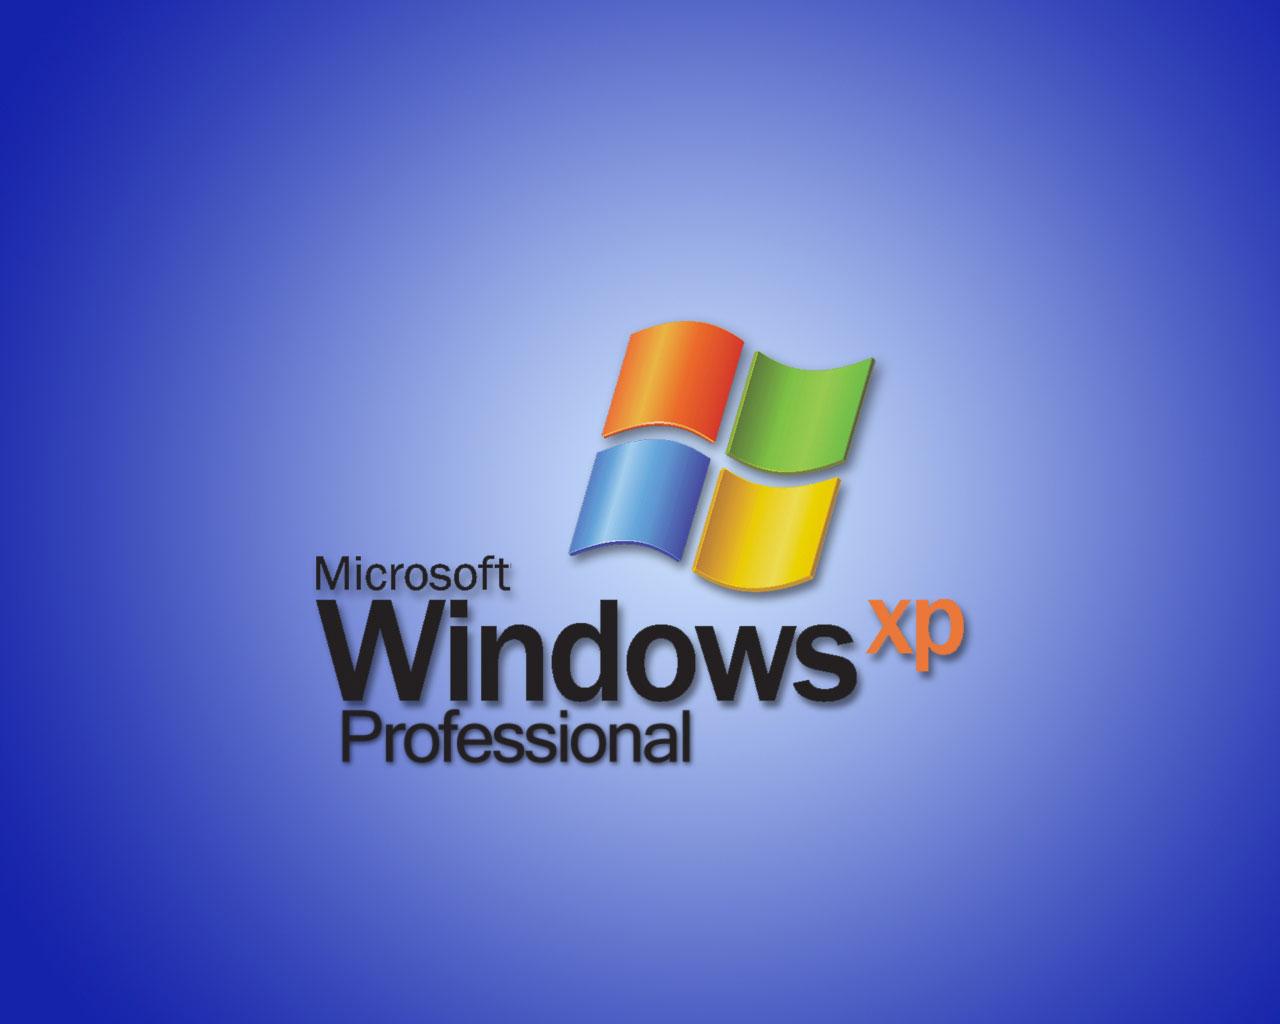 http://2.bp.blogspot.com/_Of3W002f20M/S-0OVJw-BKI/AAAAAAAAACM/SDmQ3LTKBy0/s1600/XXMS_XP_Pro.jpg